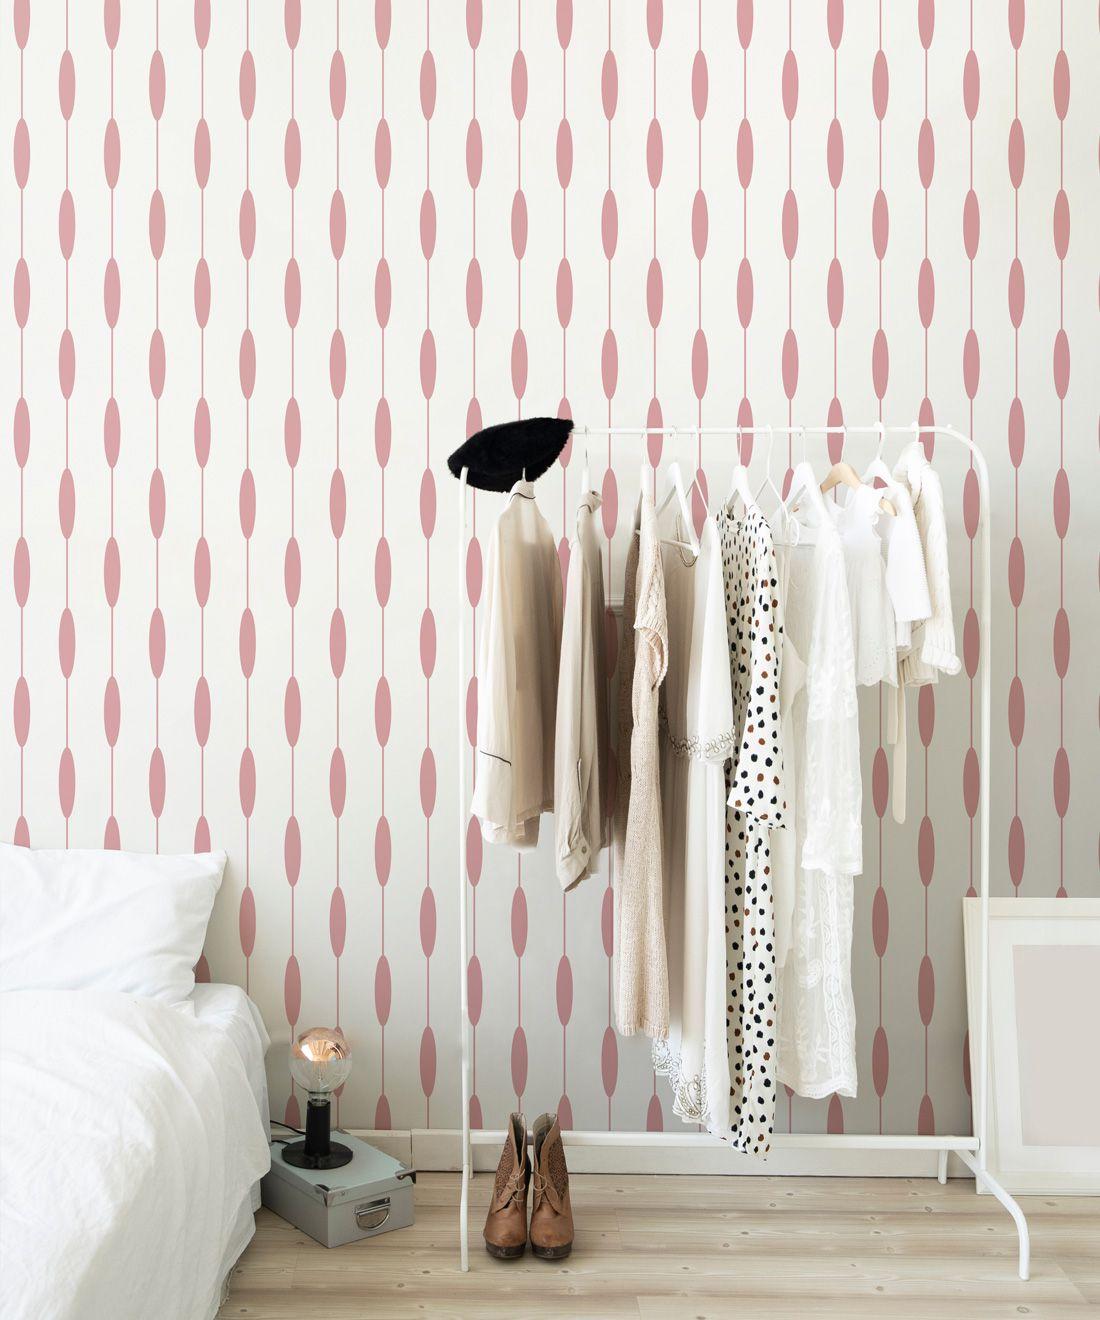 Bowline Wallpaper • Geometric Wallpaper • Striped Wallpaper • Pink Wallpaper •Insitu